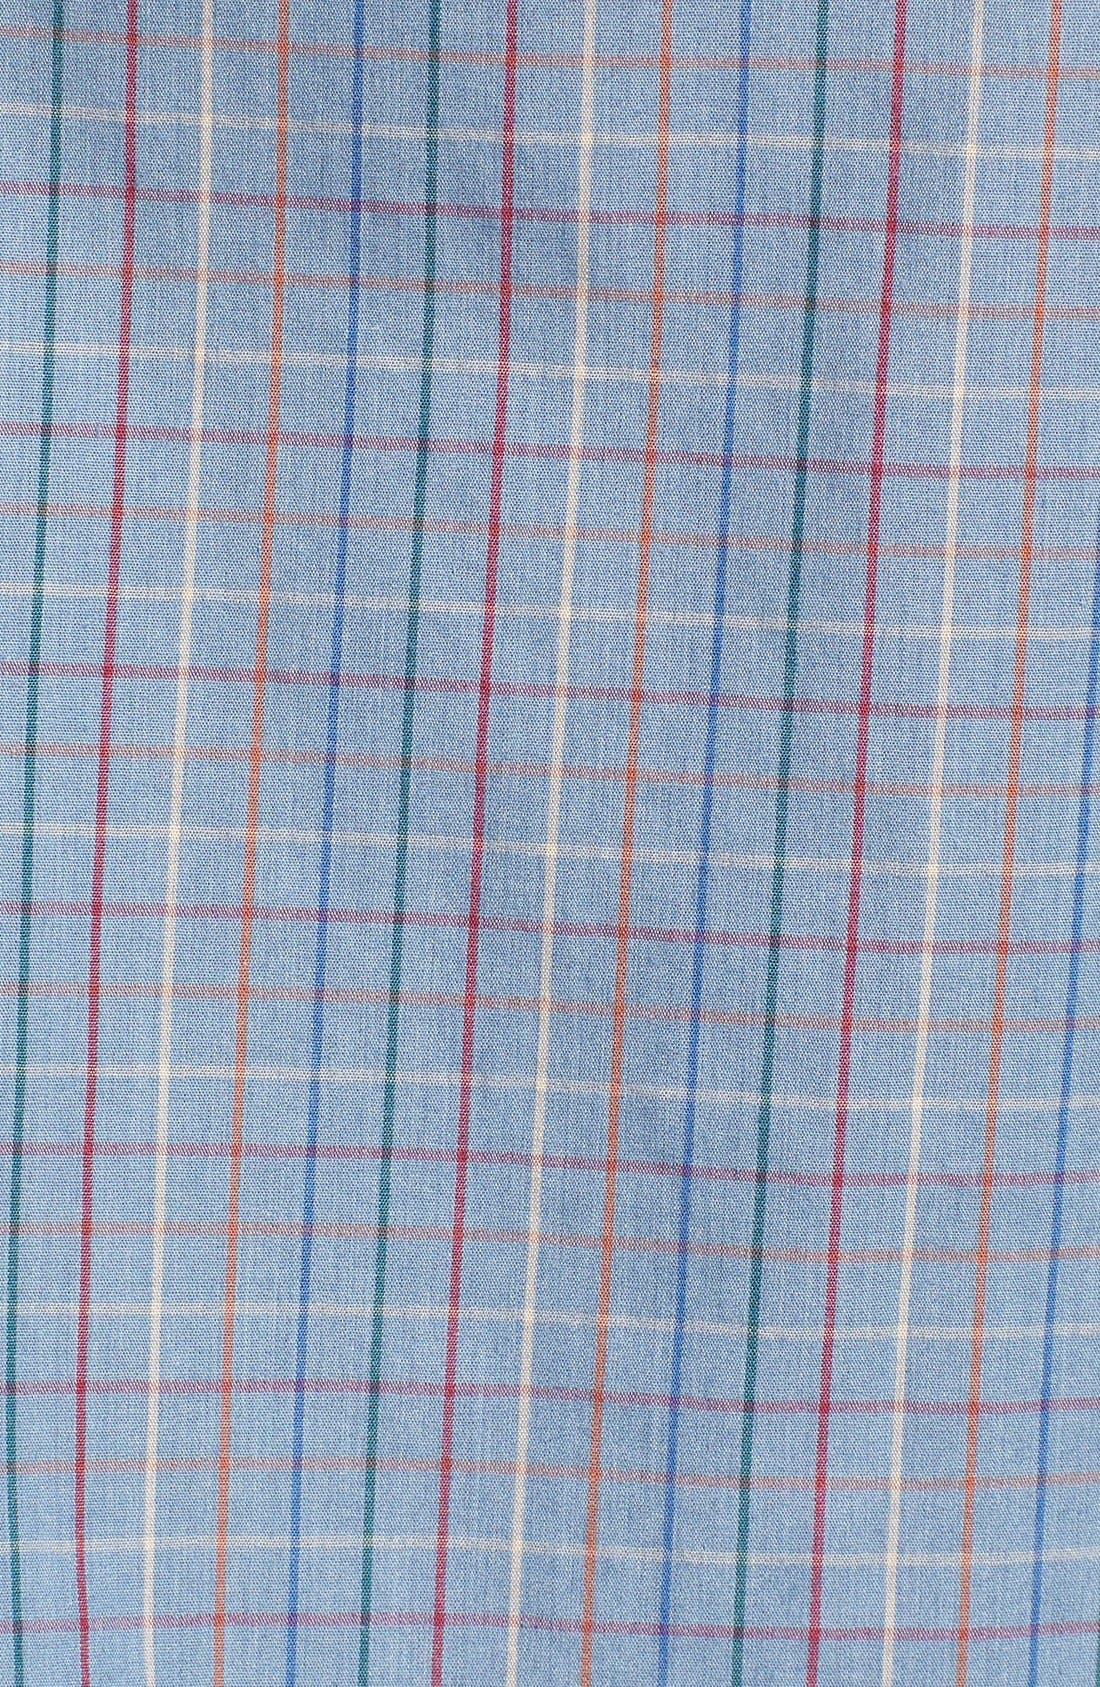 'Memphis' Trim Fit Plaid Short Sleeve Woven Shirt,                             Alternate thumbnail 5, color,                             Washed Blue